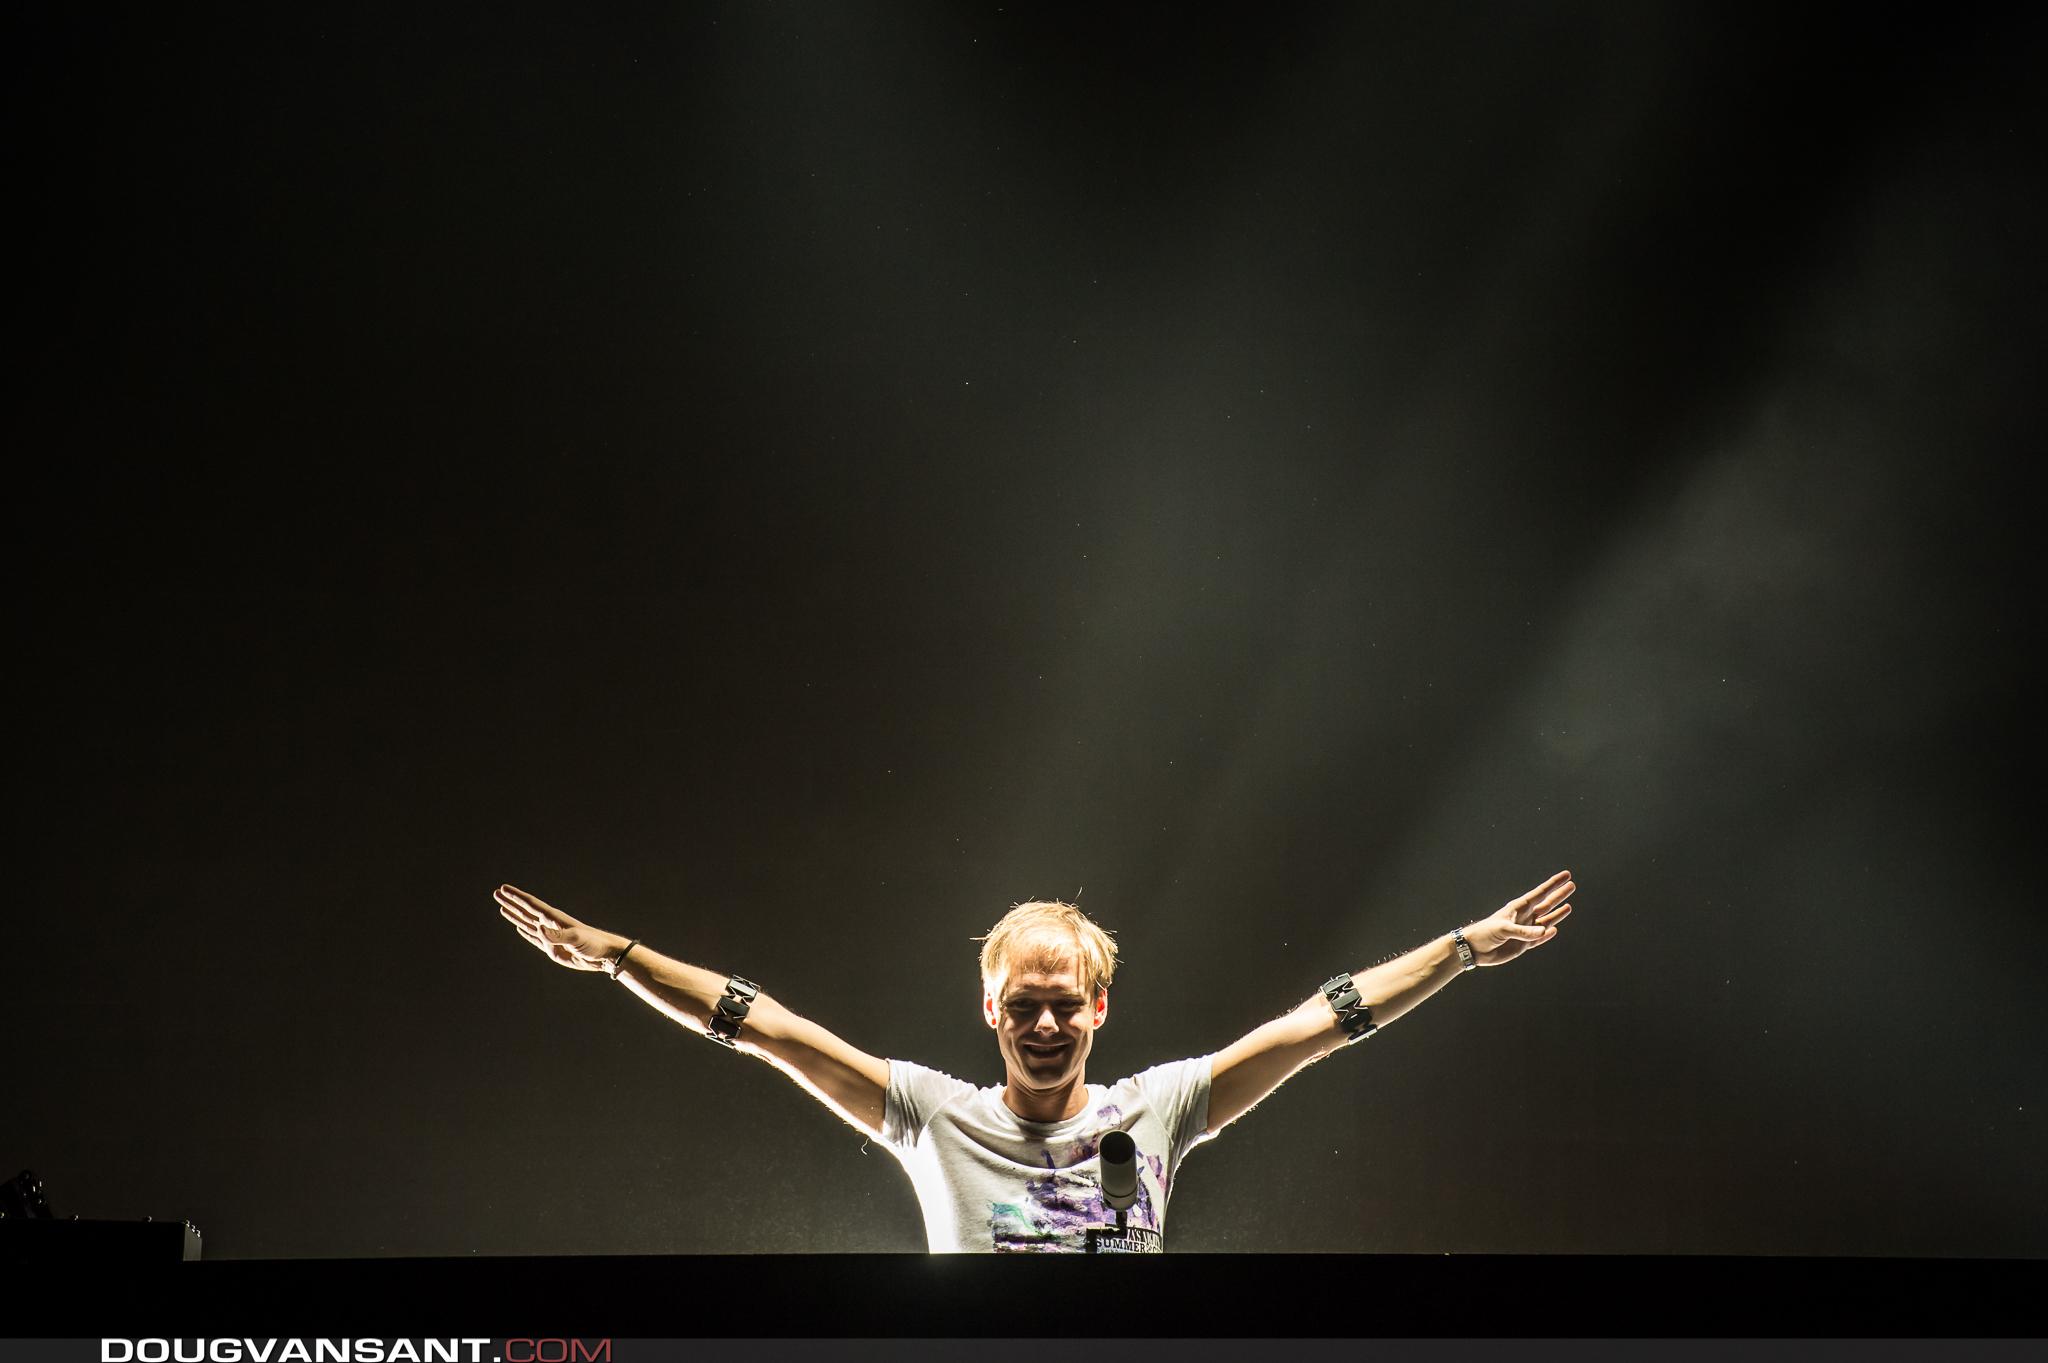 Armin van Buuren is set to take on Ultra with his ASOT stage this weekend. Photo: Doug Van Sant